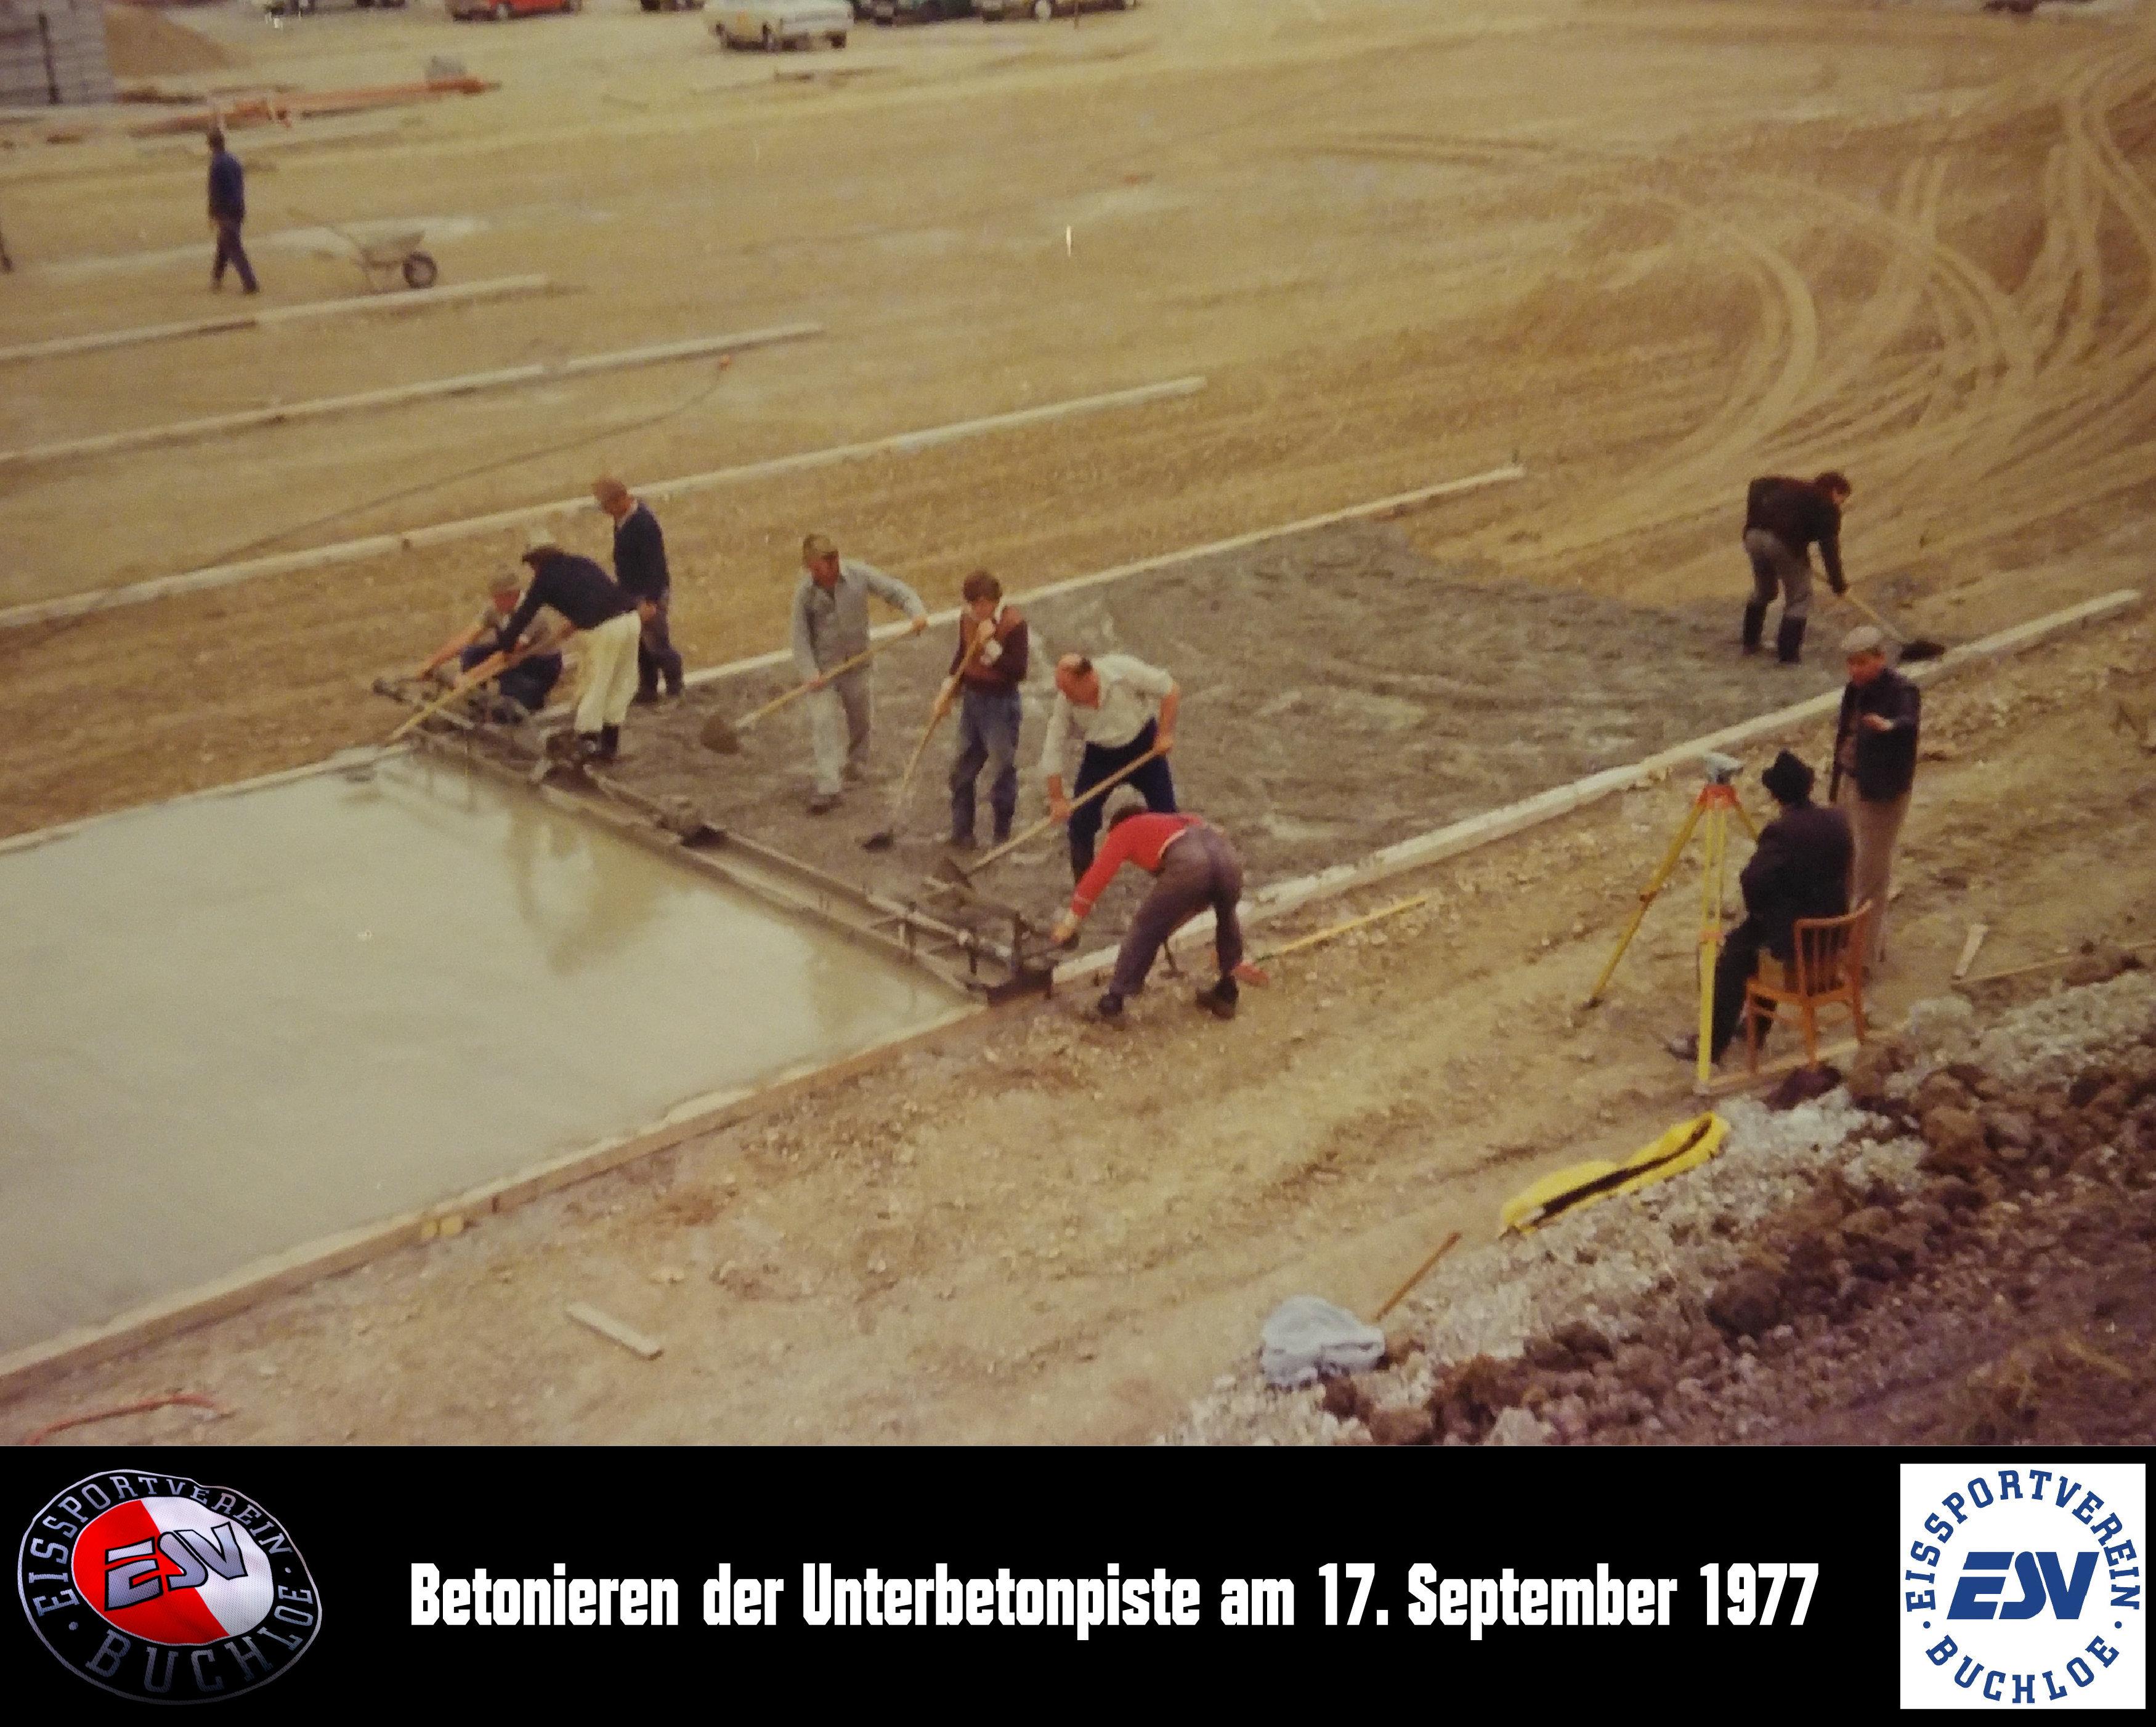 05 Betonieren der Unterbetonpiste